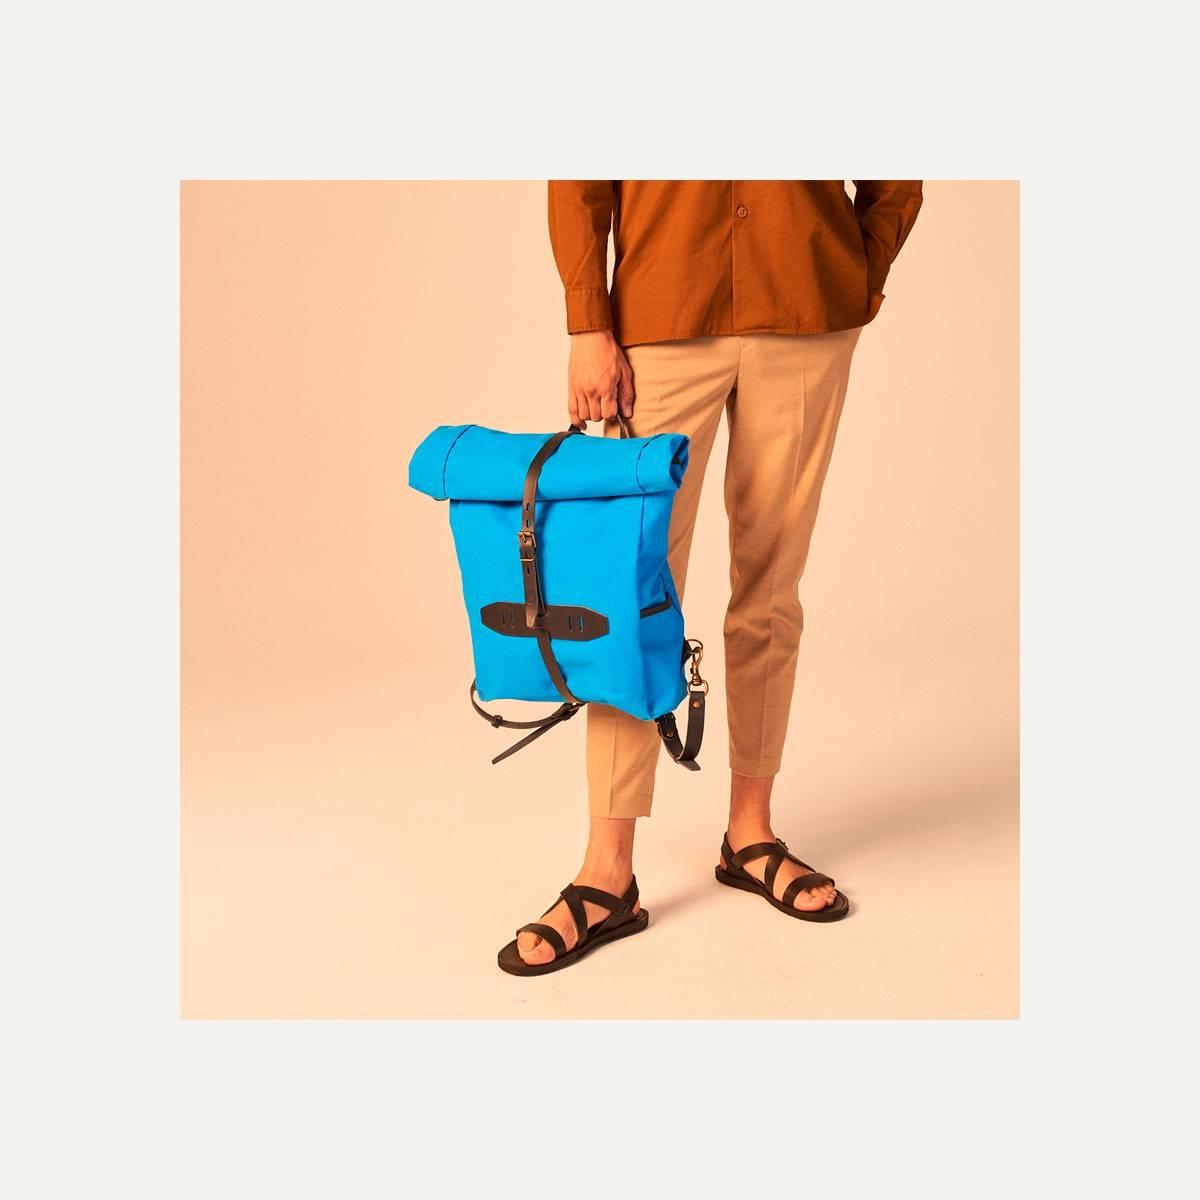 Jamy Backpack - Regentex Blue (image n°11)